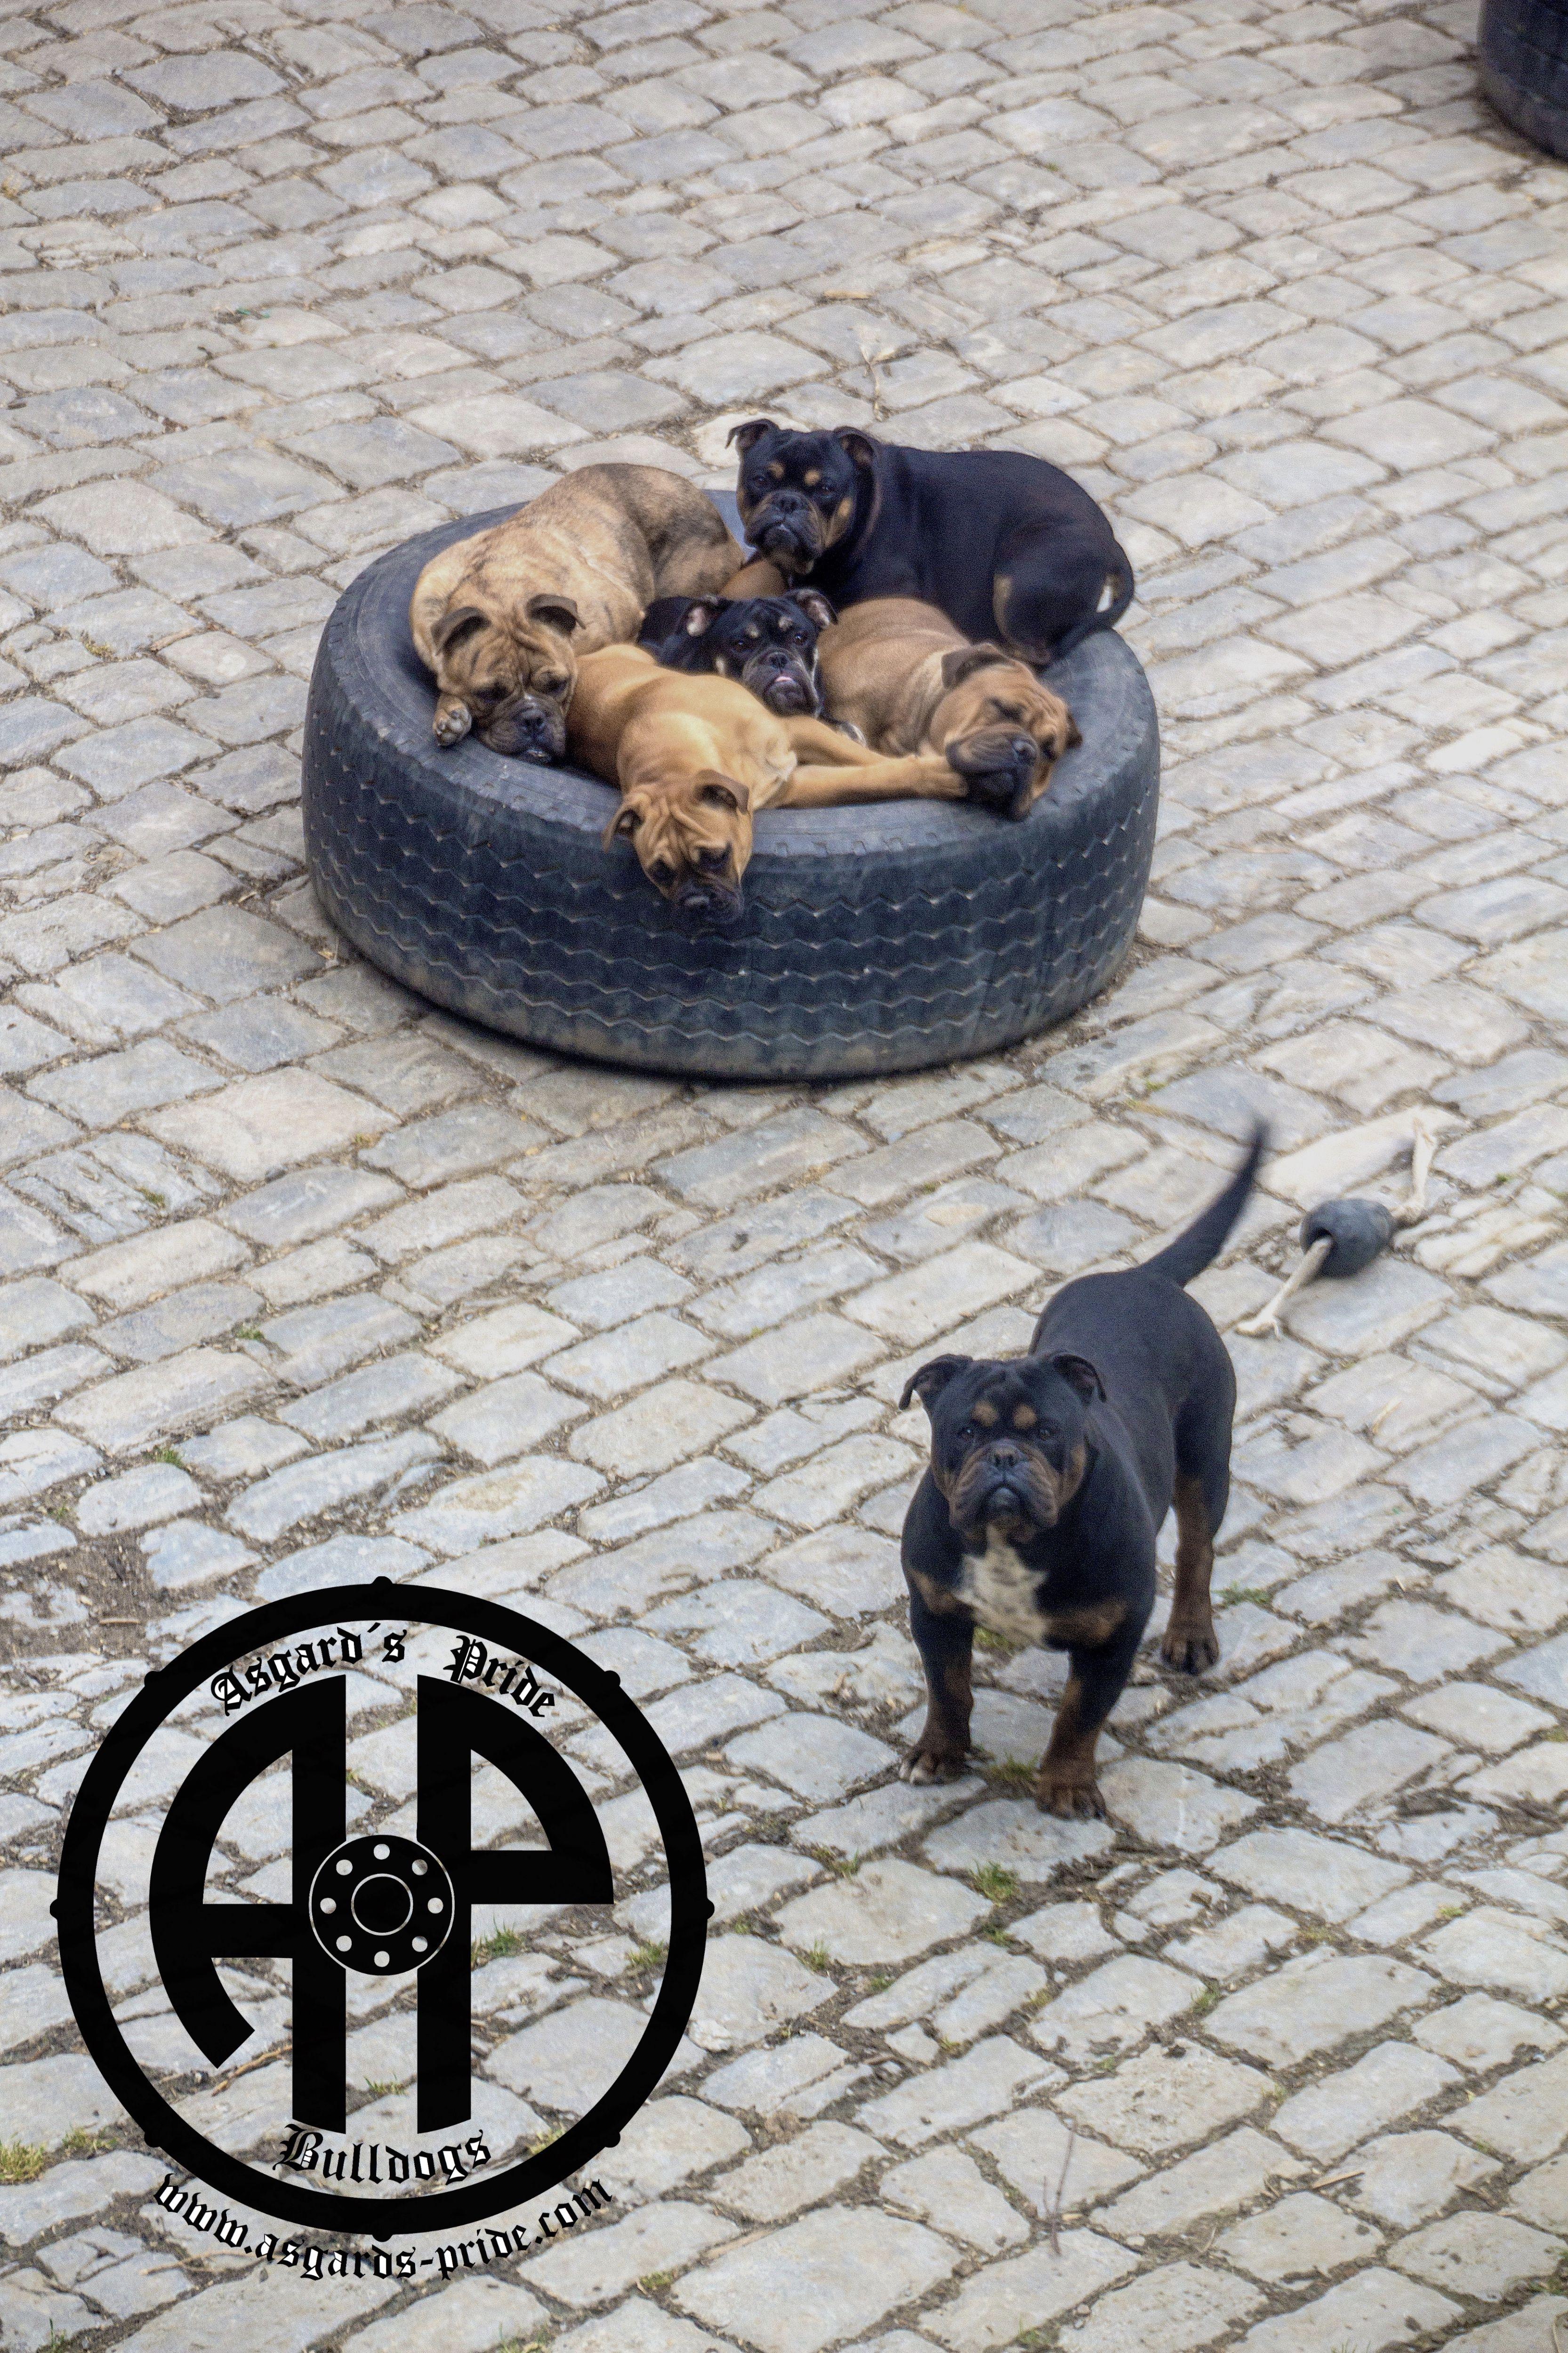 Canneo And Continental Bulldogs Sleeping In A Tyre Ap Hagal Has No Space Left Continental Bulldog Englische Bulldogge Bulldogge